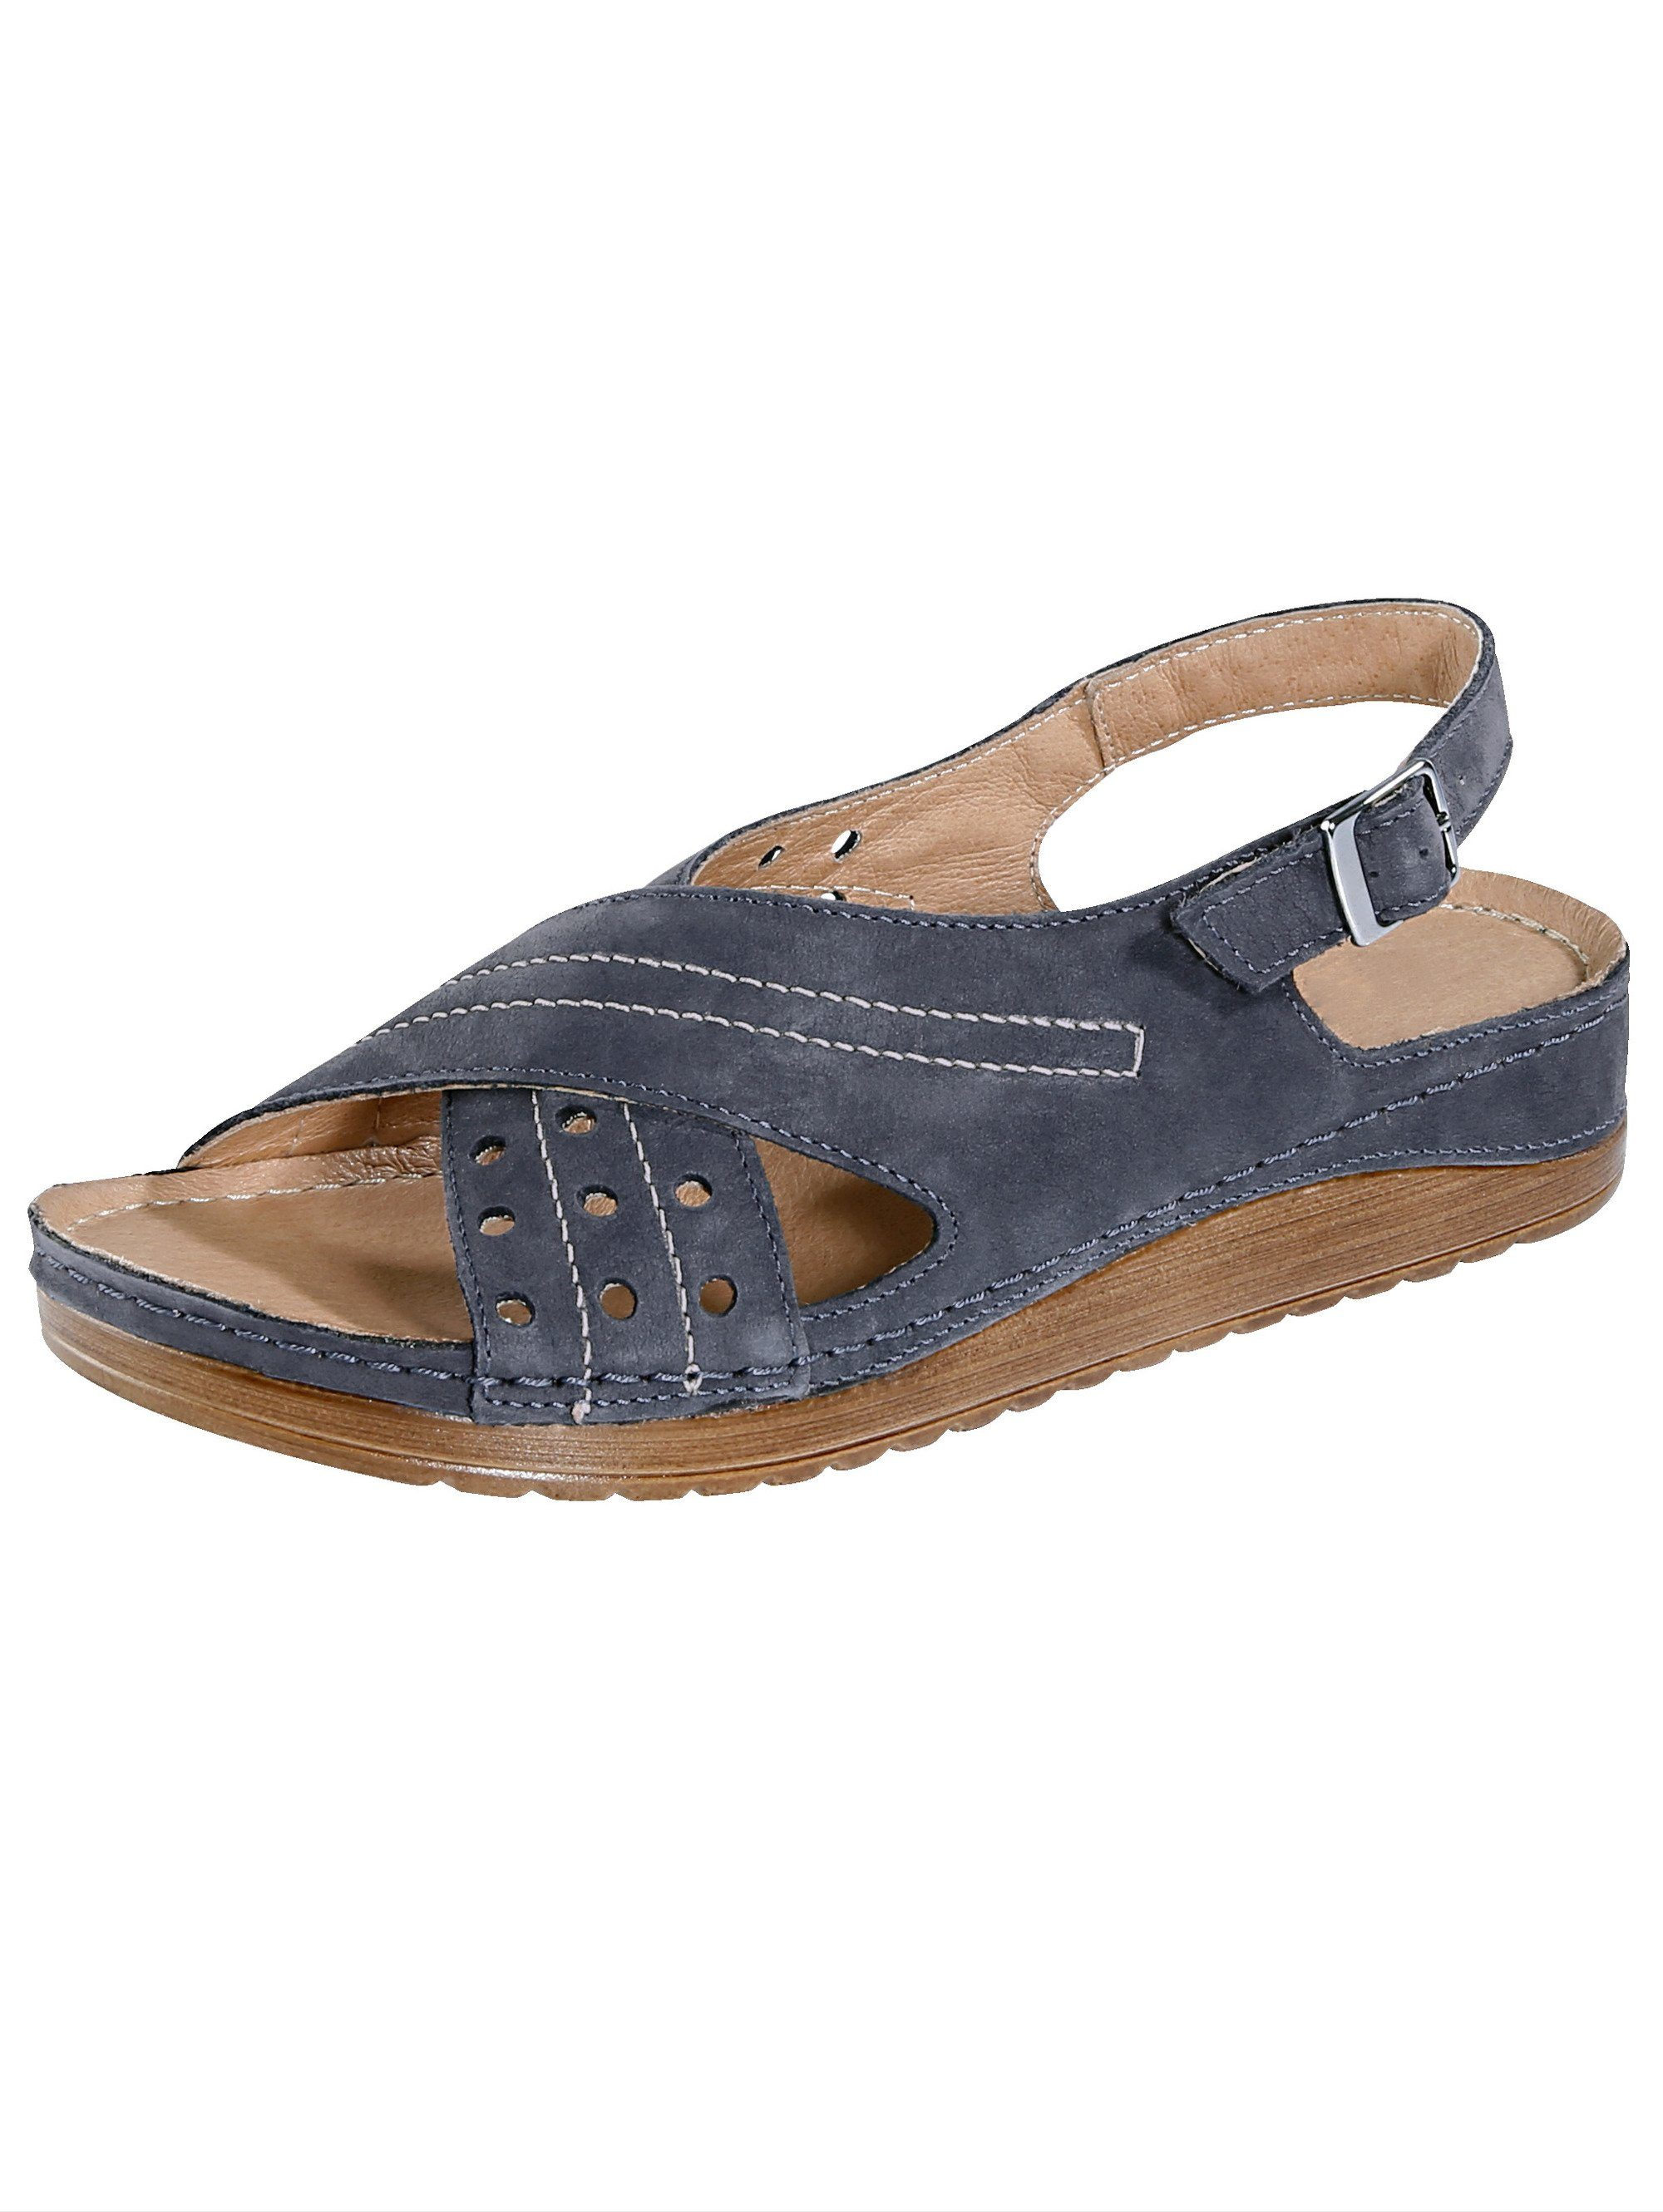 Naturläufer Sandale blau Damen Sandaletten Sandalen Sandalen/